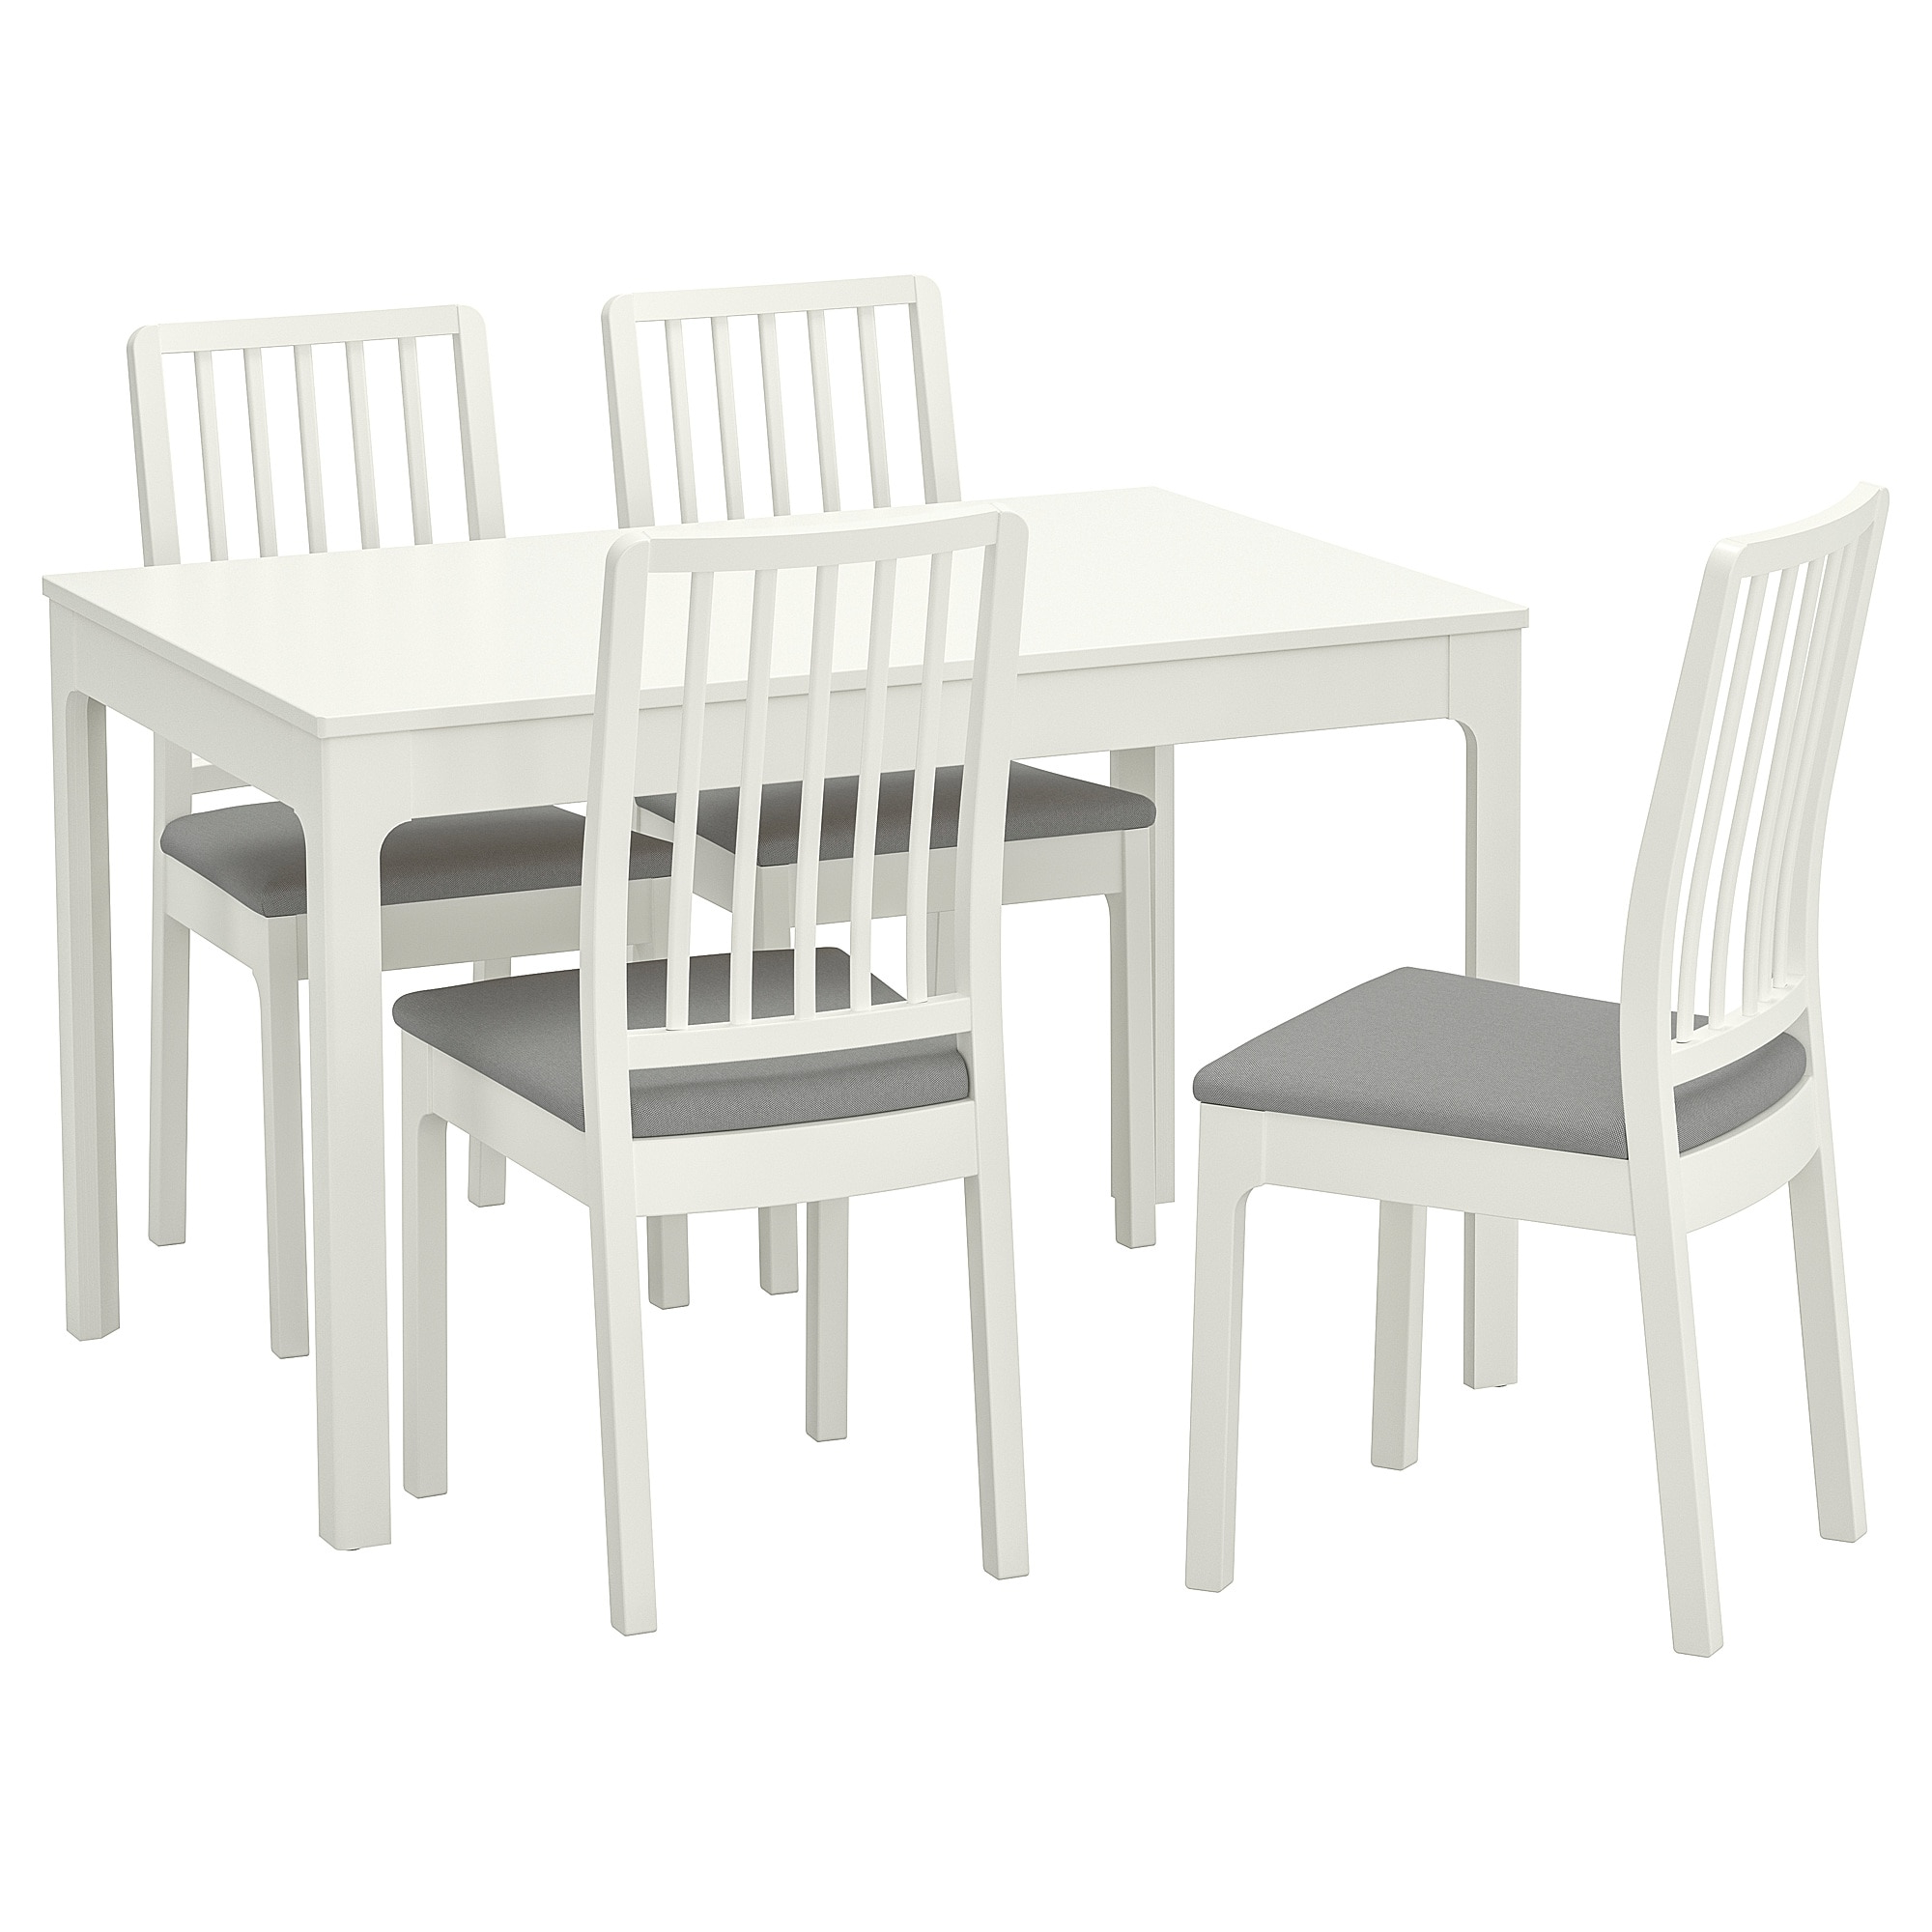 Ikea mesas de comedor cheap mesa de comedor de la nueva for Ikea catalogo mesas comedor